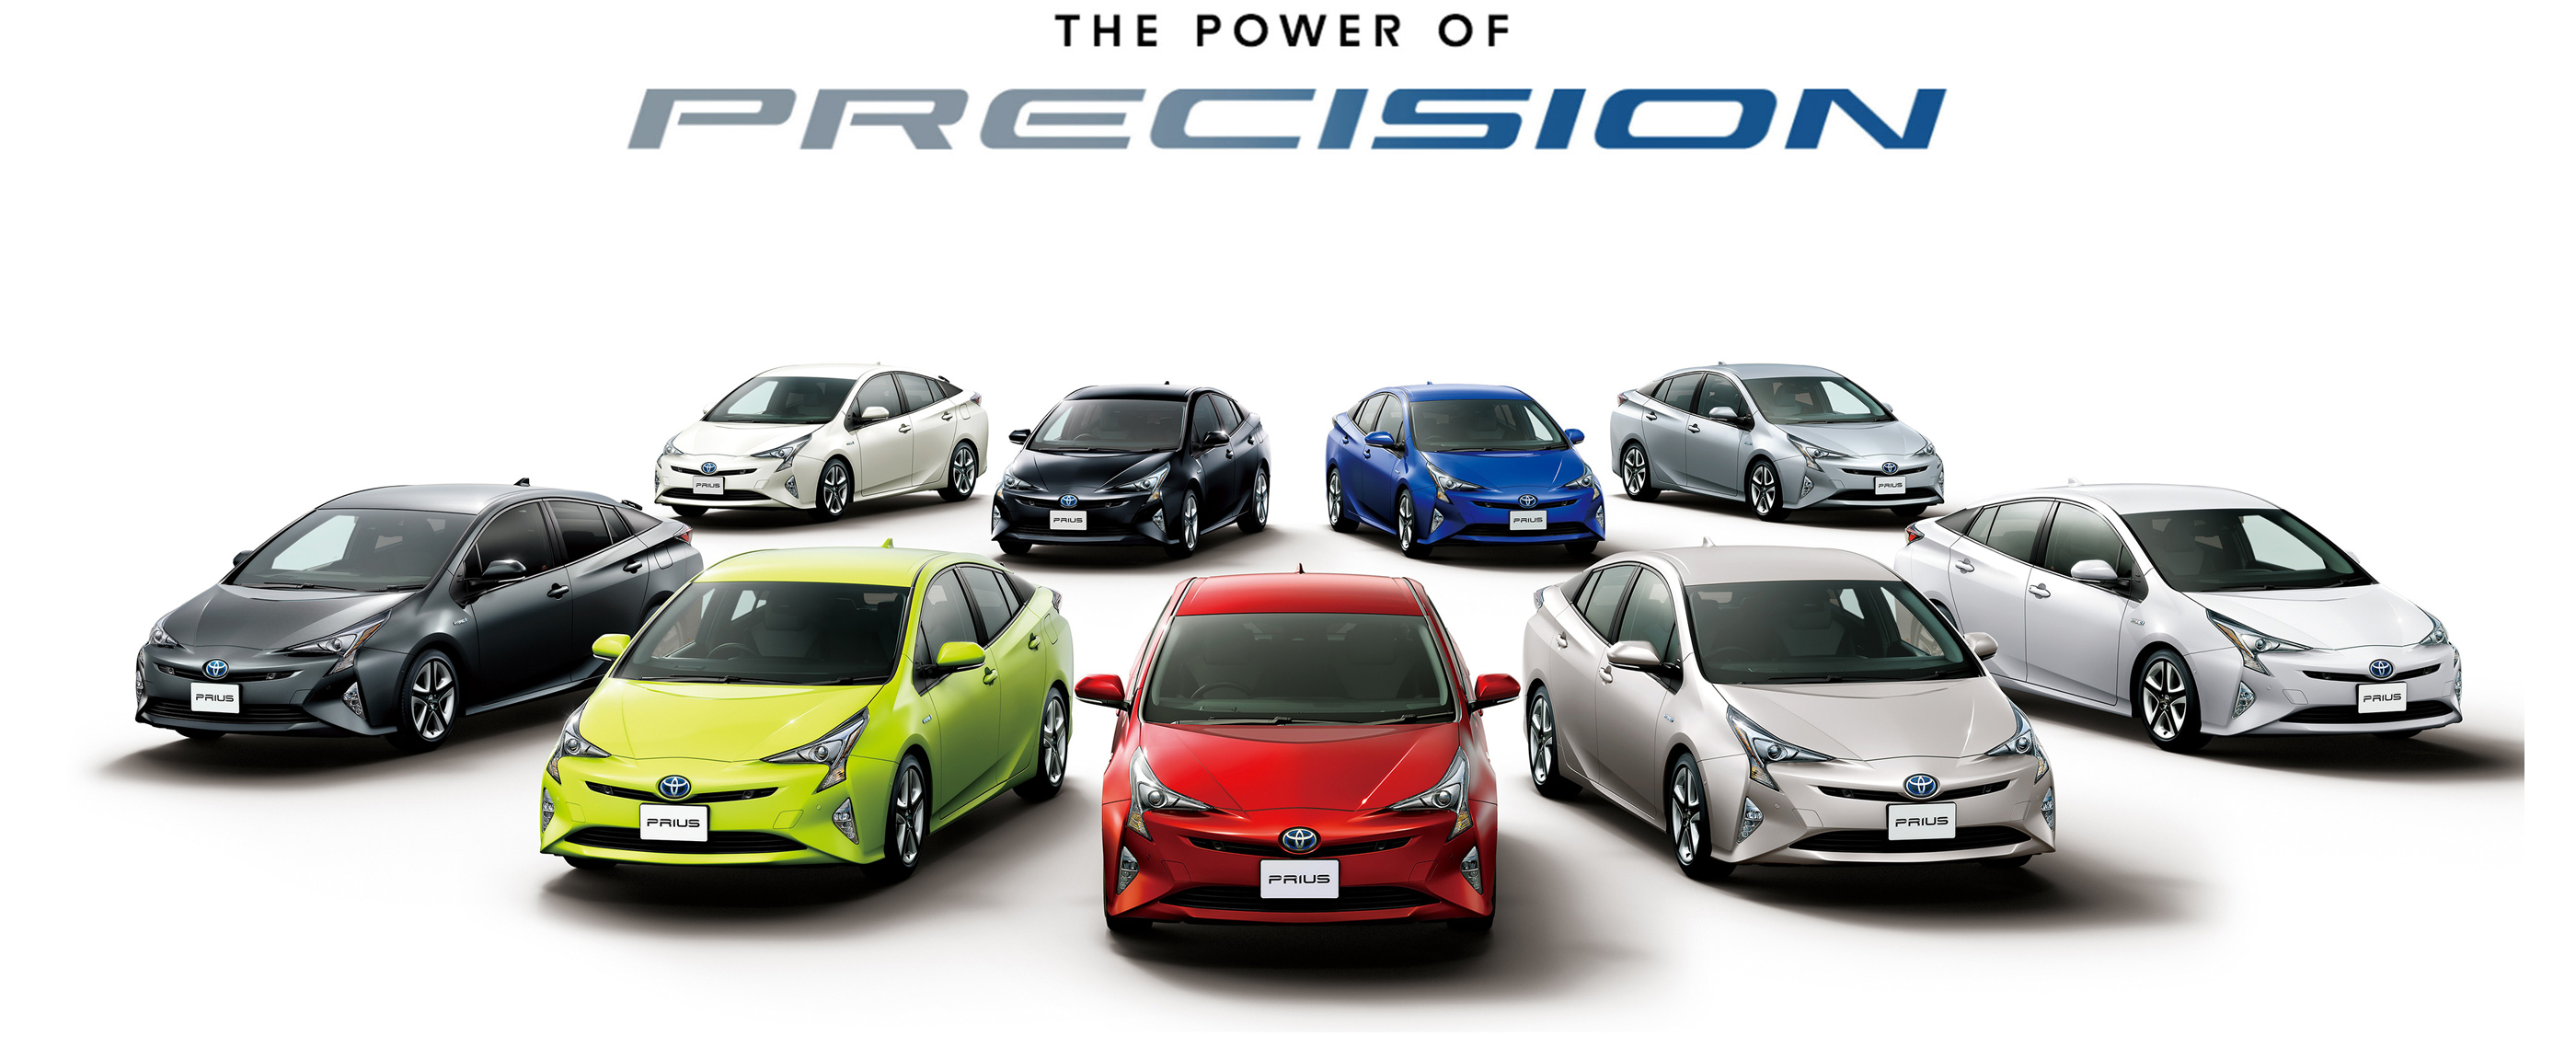 Hybrid Racing Toyota Cars Pickering Toyota